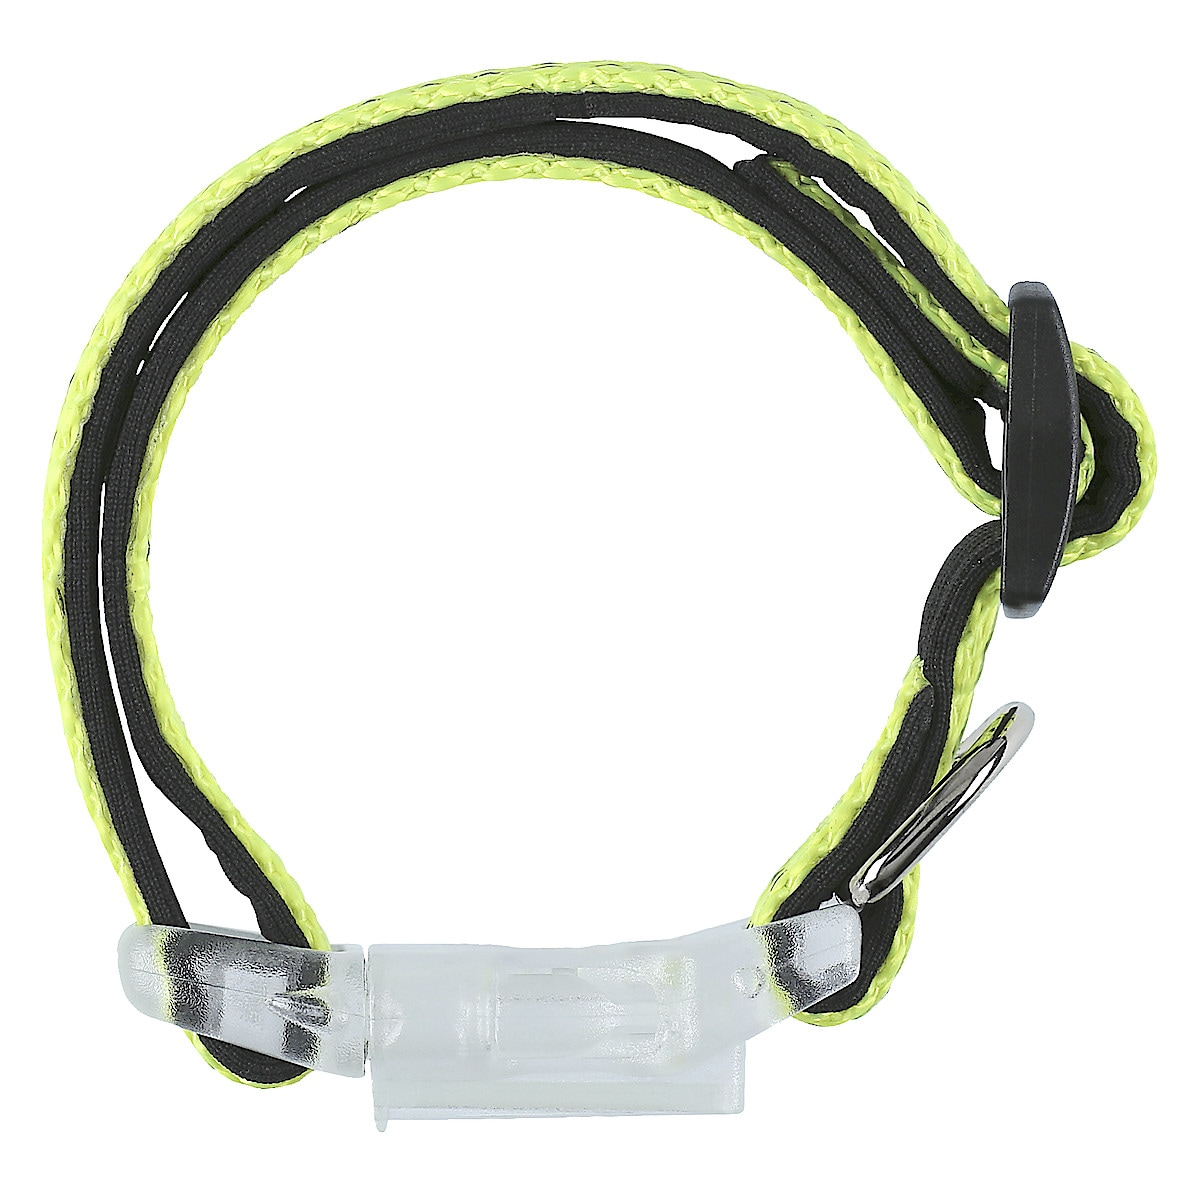 Koiran kaulapanta 20-30 cm